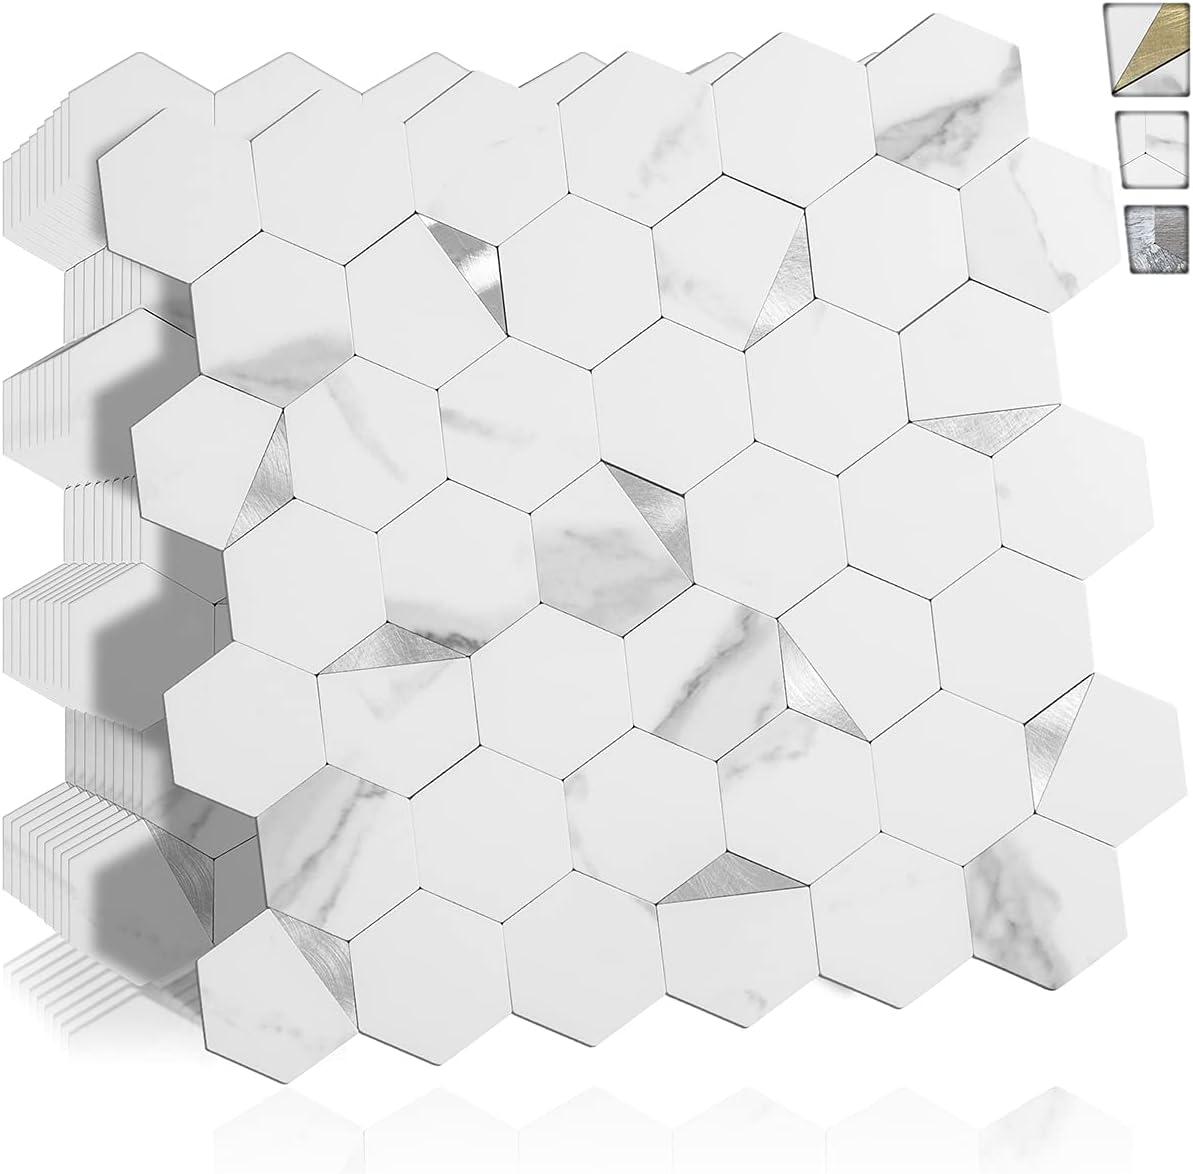 DICOFUN 10 Sheets Hexagon Limited time cheap sale Tile Stick Max 44% OFF White and Peel Backsplash